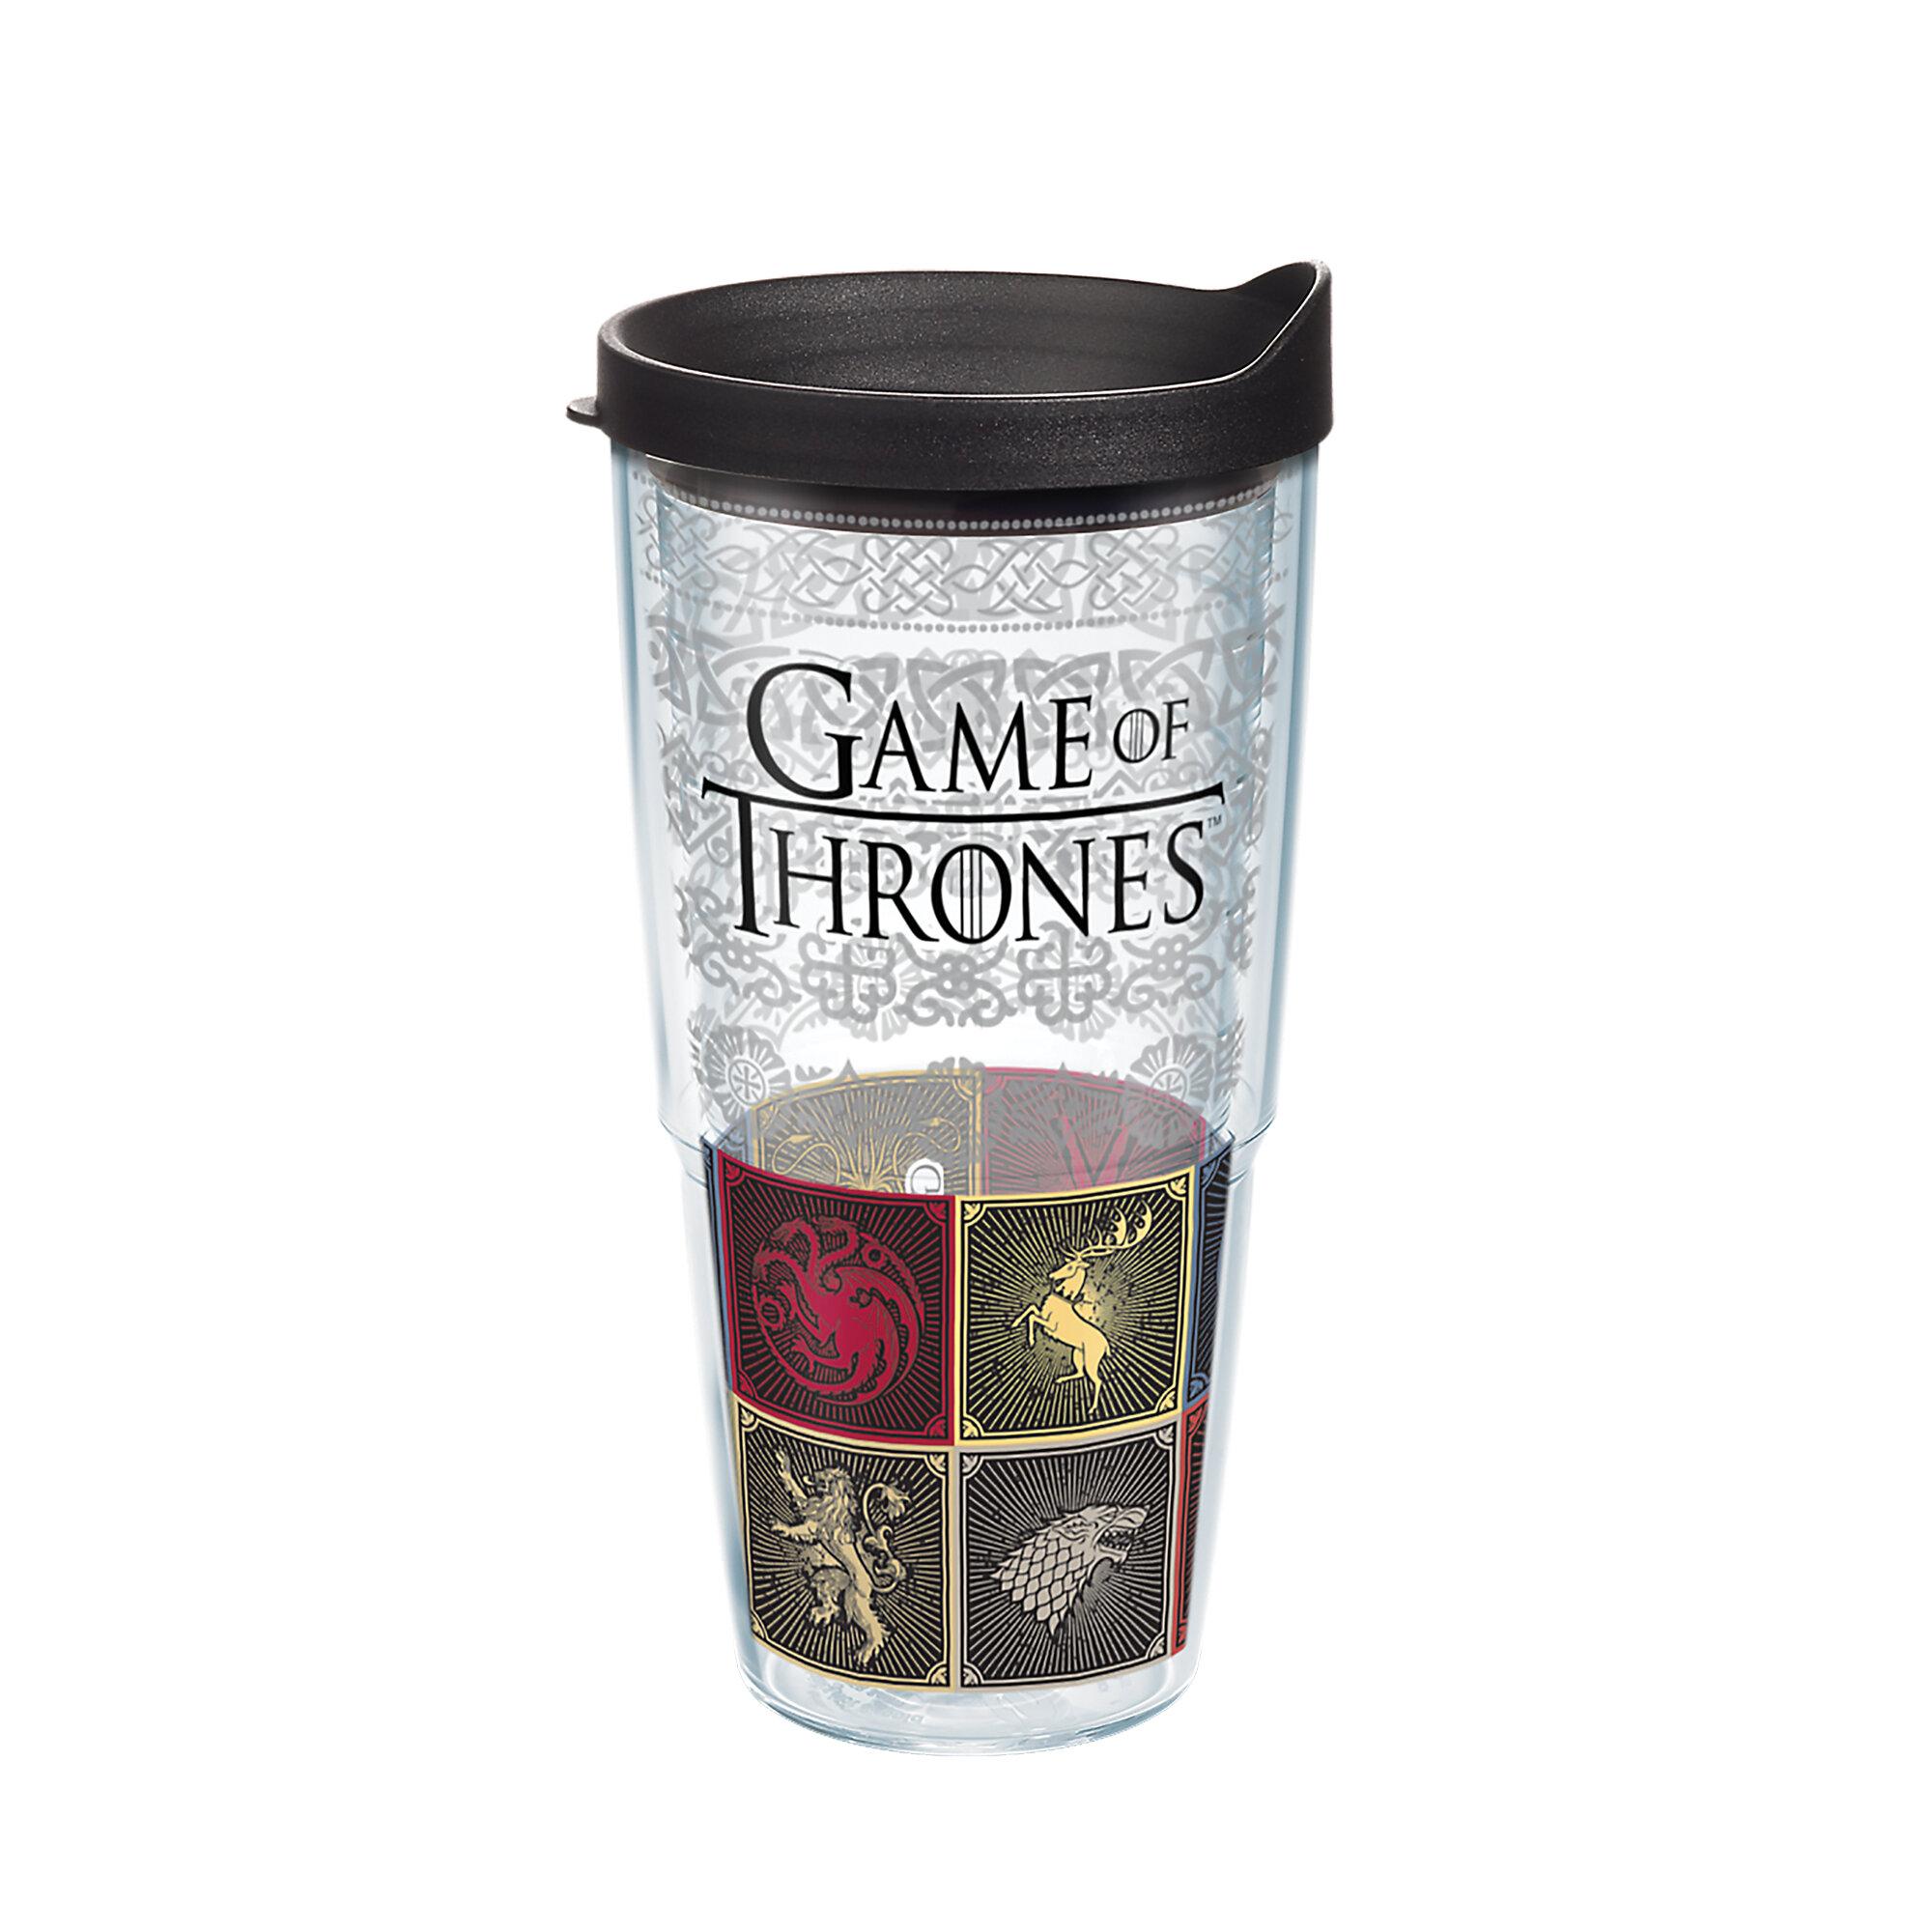 32379db80a1 Tervis Tumbler Game of Thrones House Sigils 24 oz Travel Tumbler | Wayfair